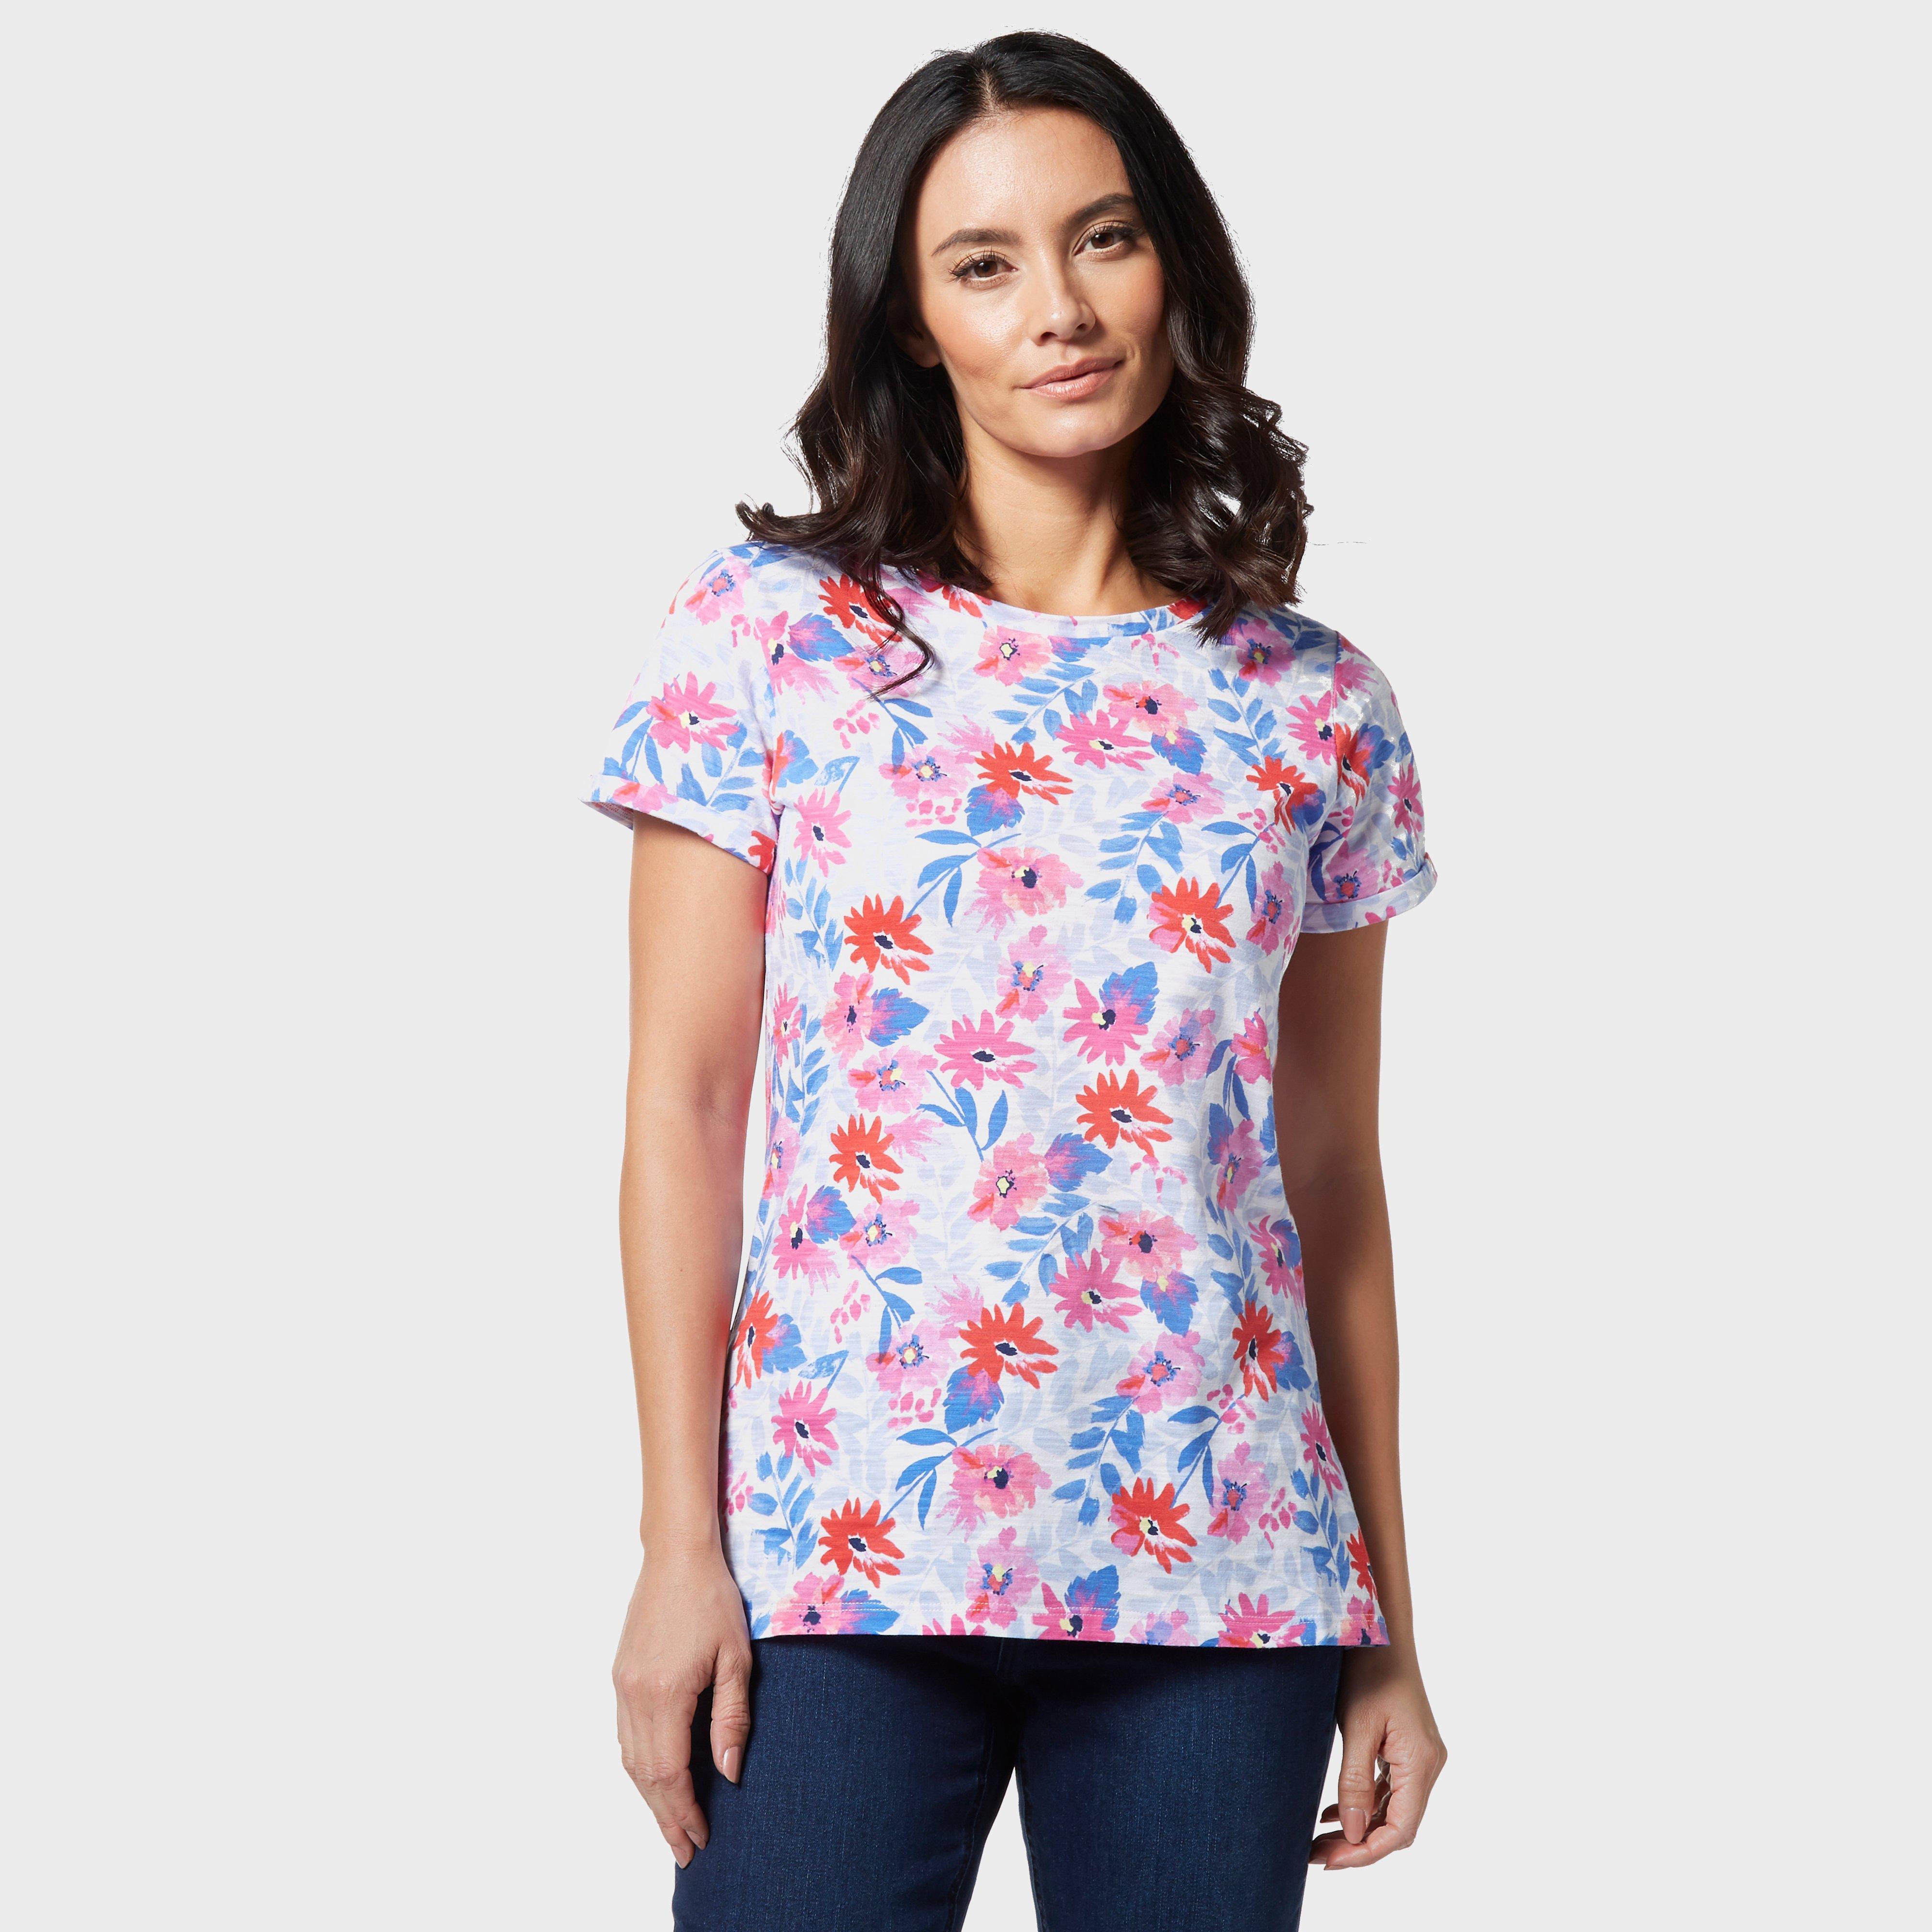 Joules Joules Womens Nessa T-Shirt - Multi, Multi